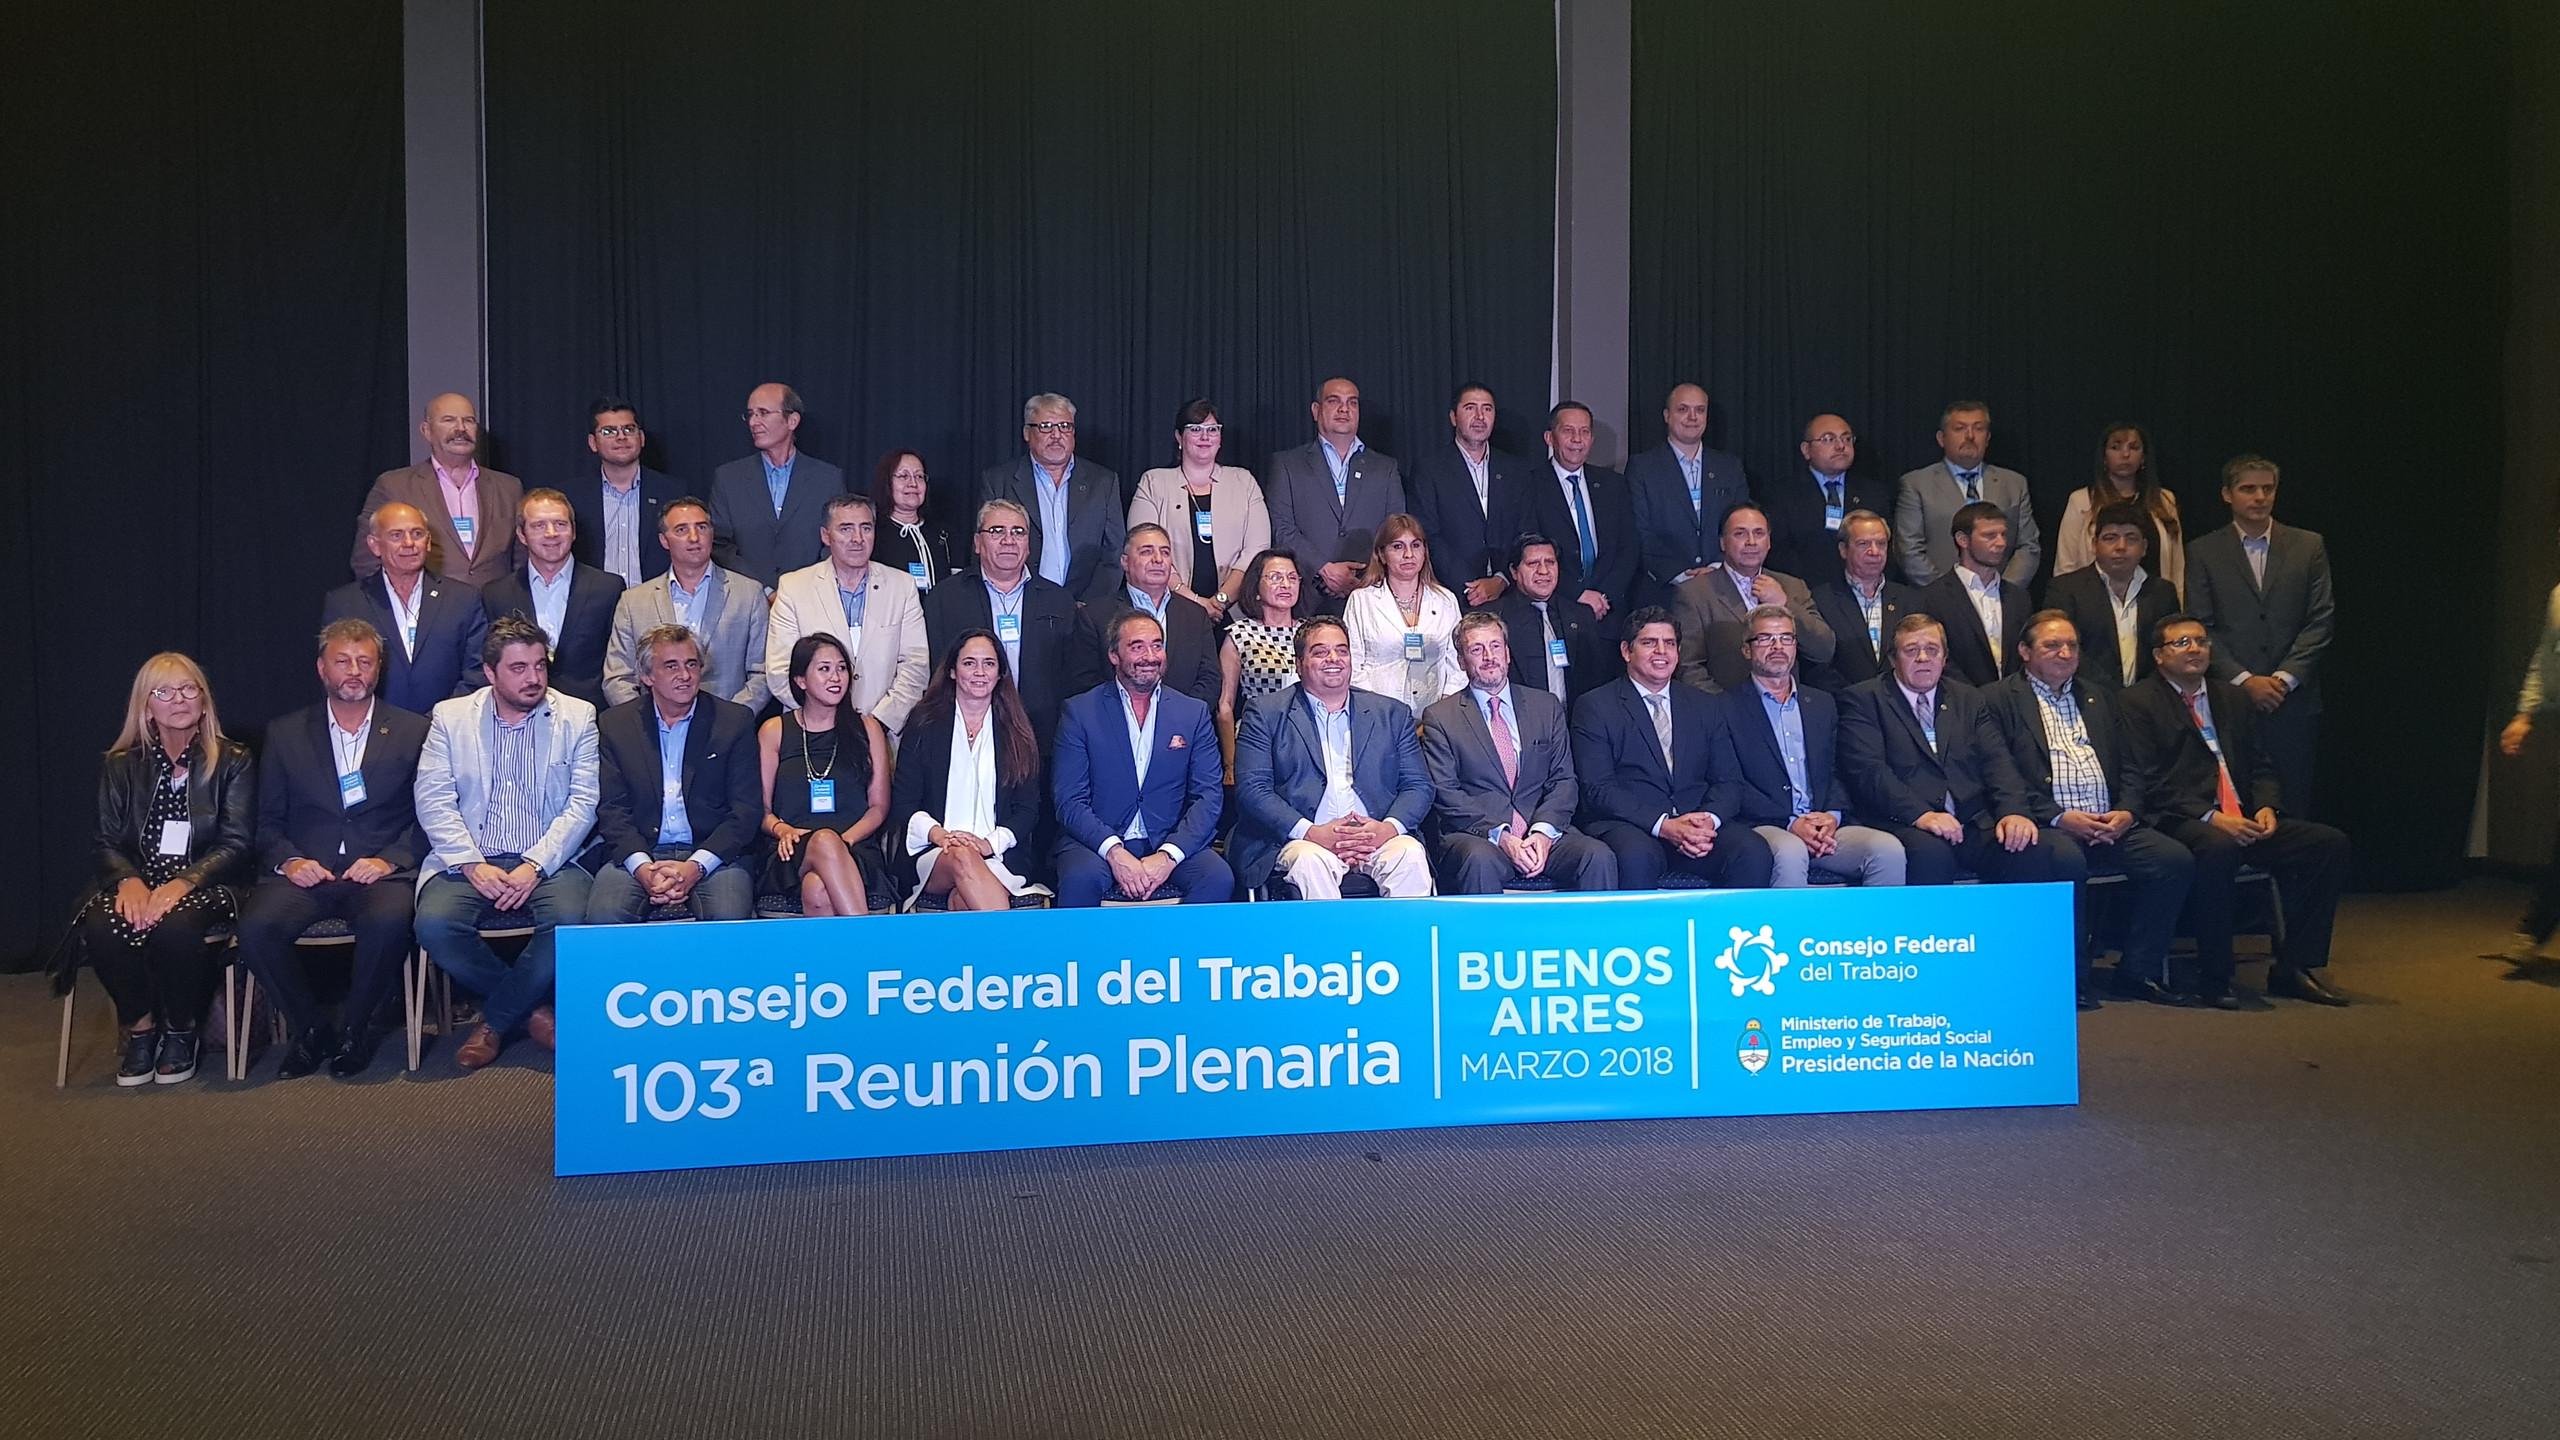 103 Reunion Plenaria